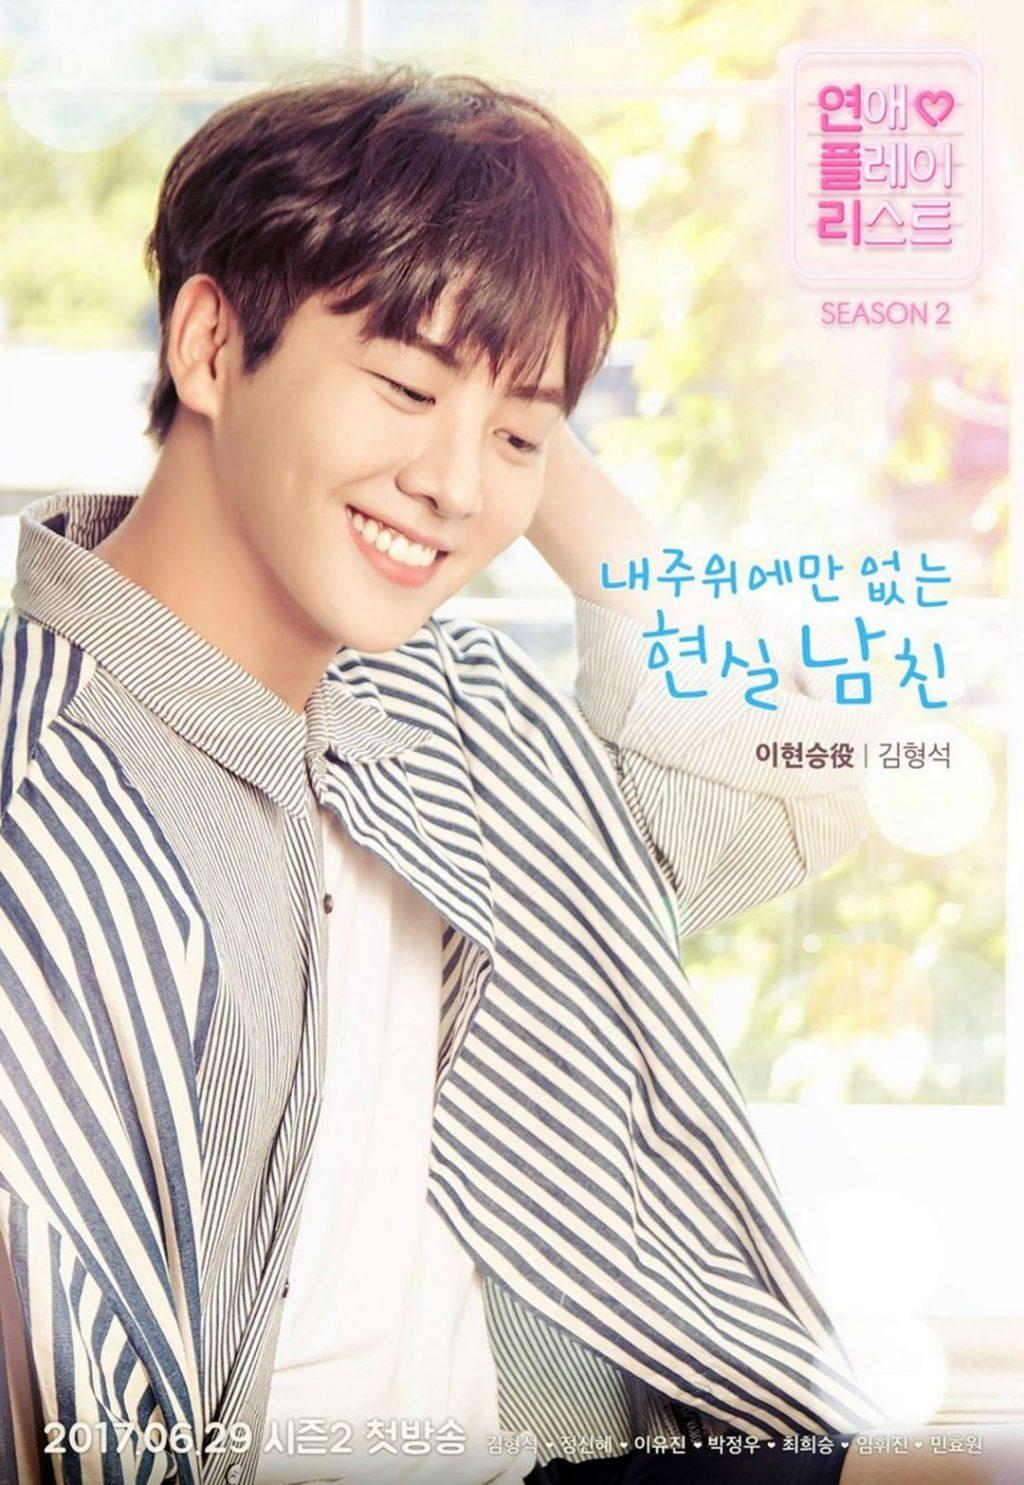 Kim Hyung Suk sebagai Lee Hyun Seung 1